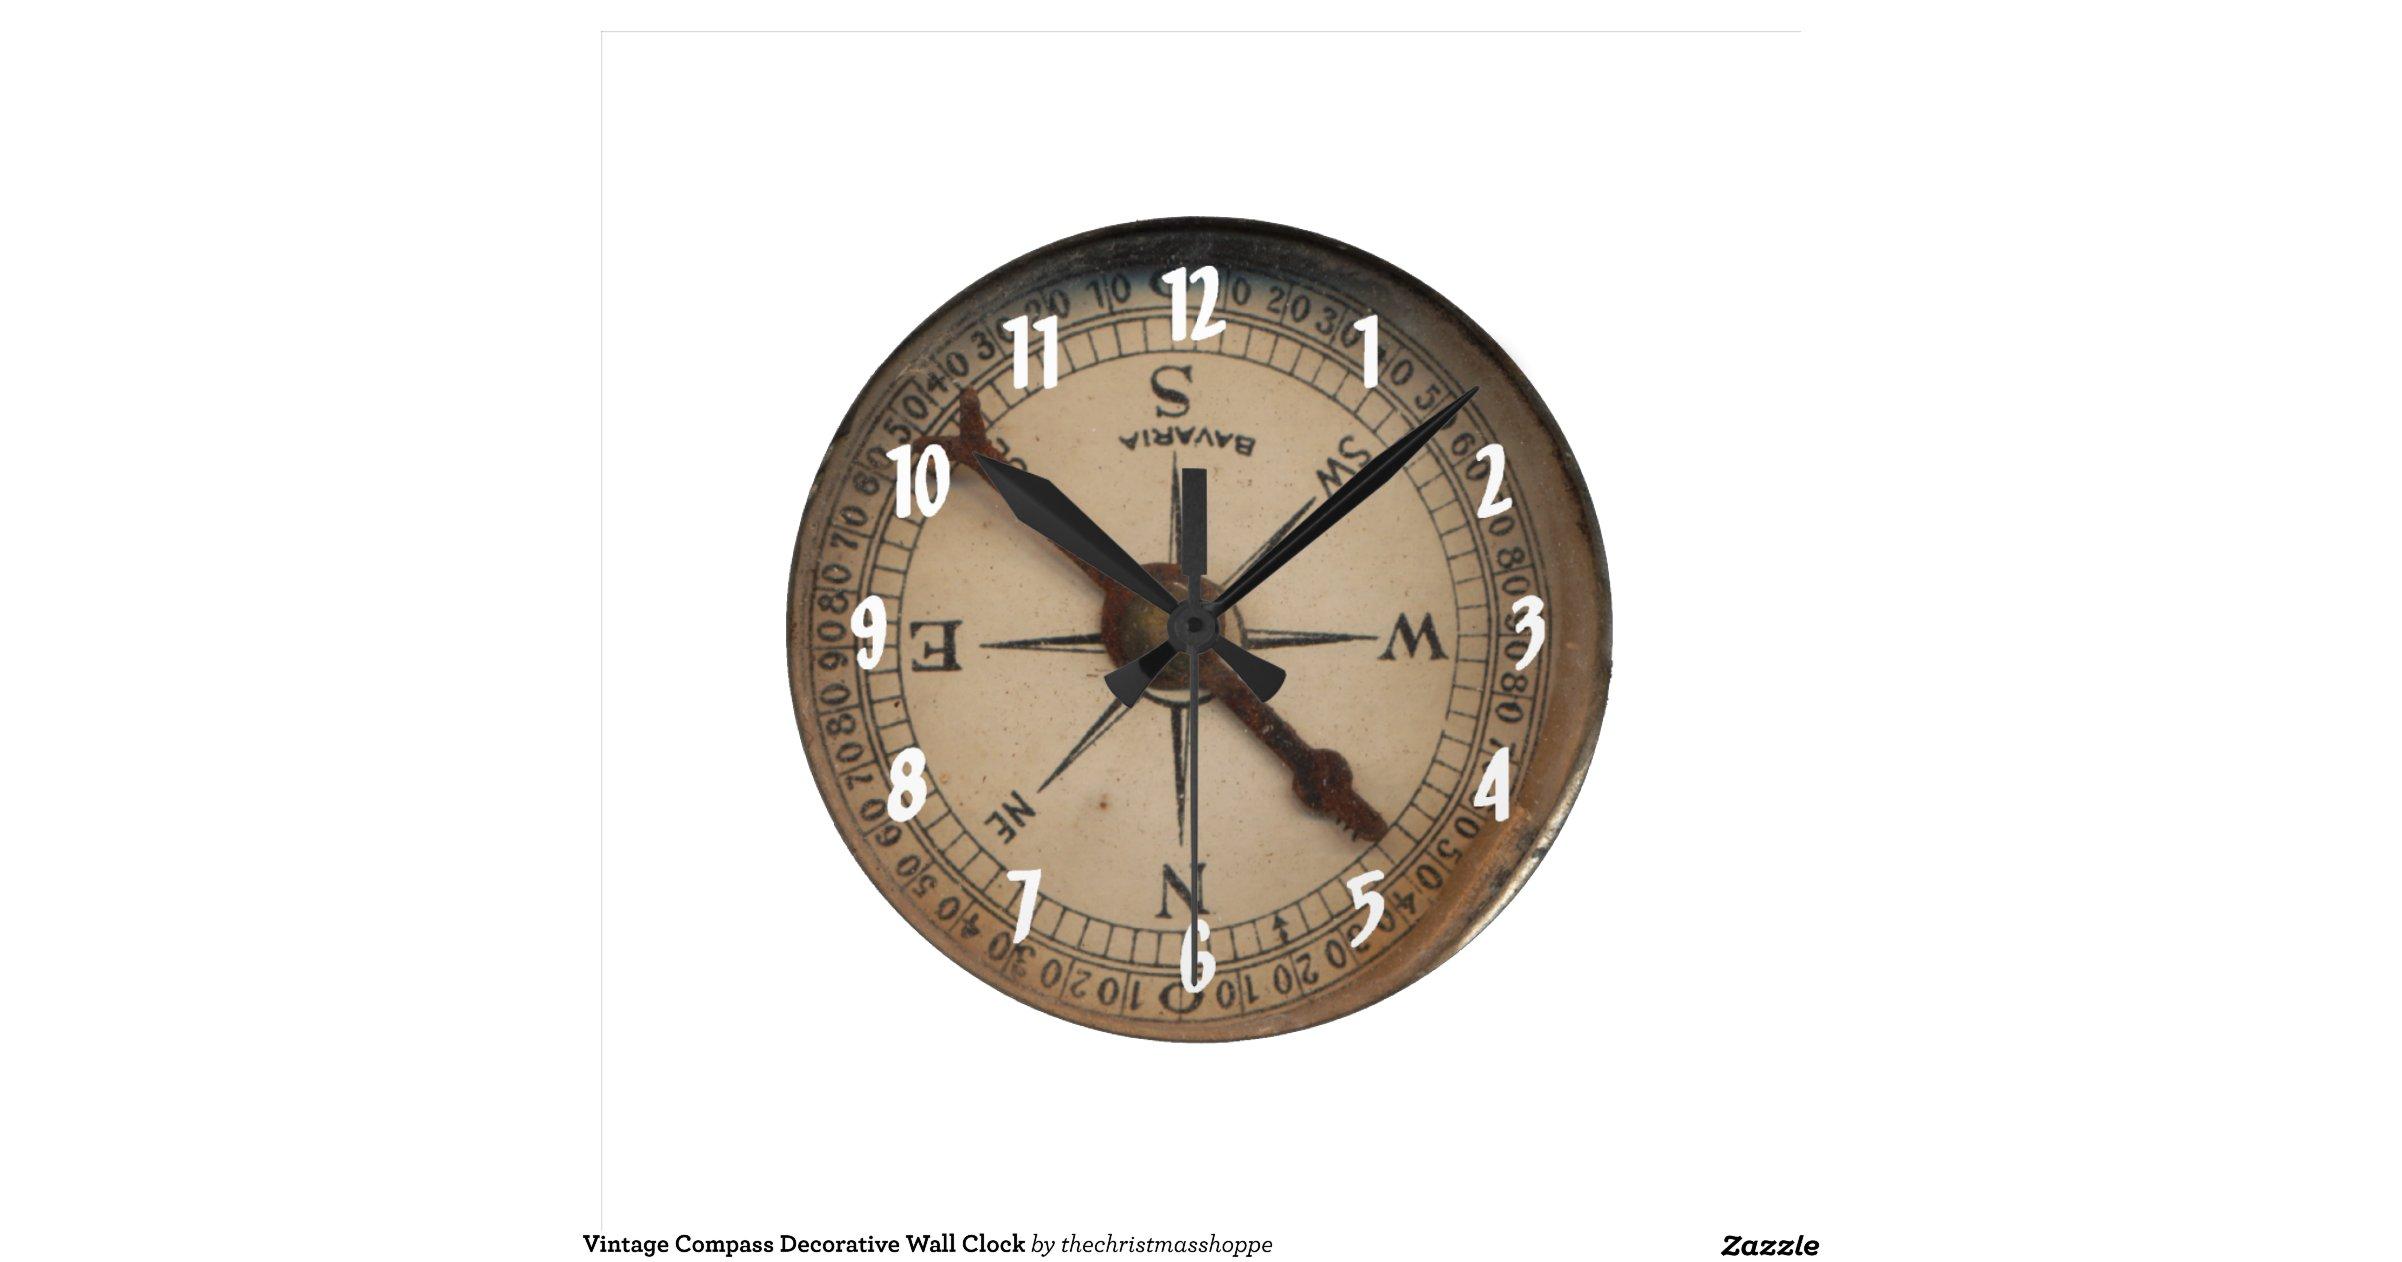 Decorative Wall Clock Model : Vintage compass decorative wall clock